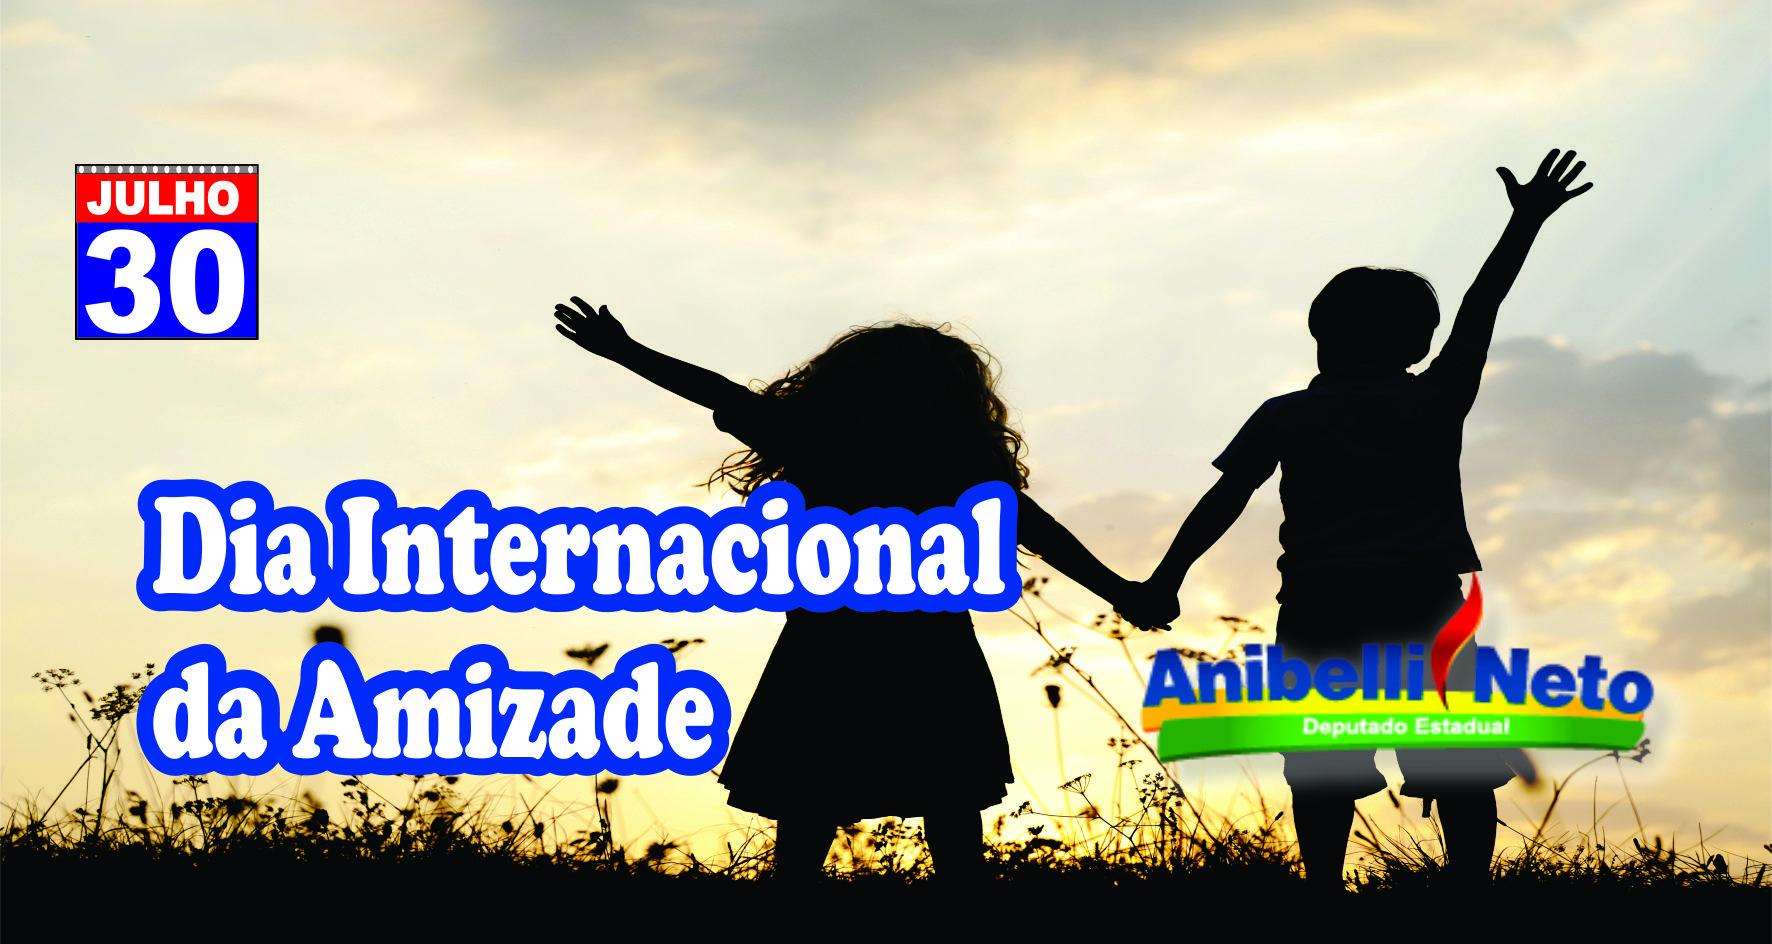 Dia Internacional da Amizade